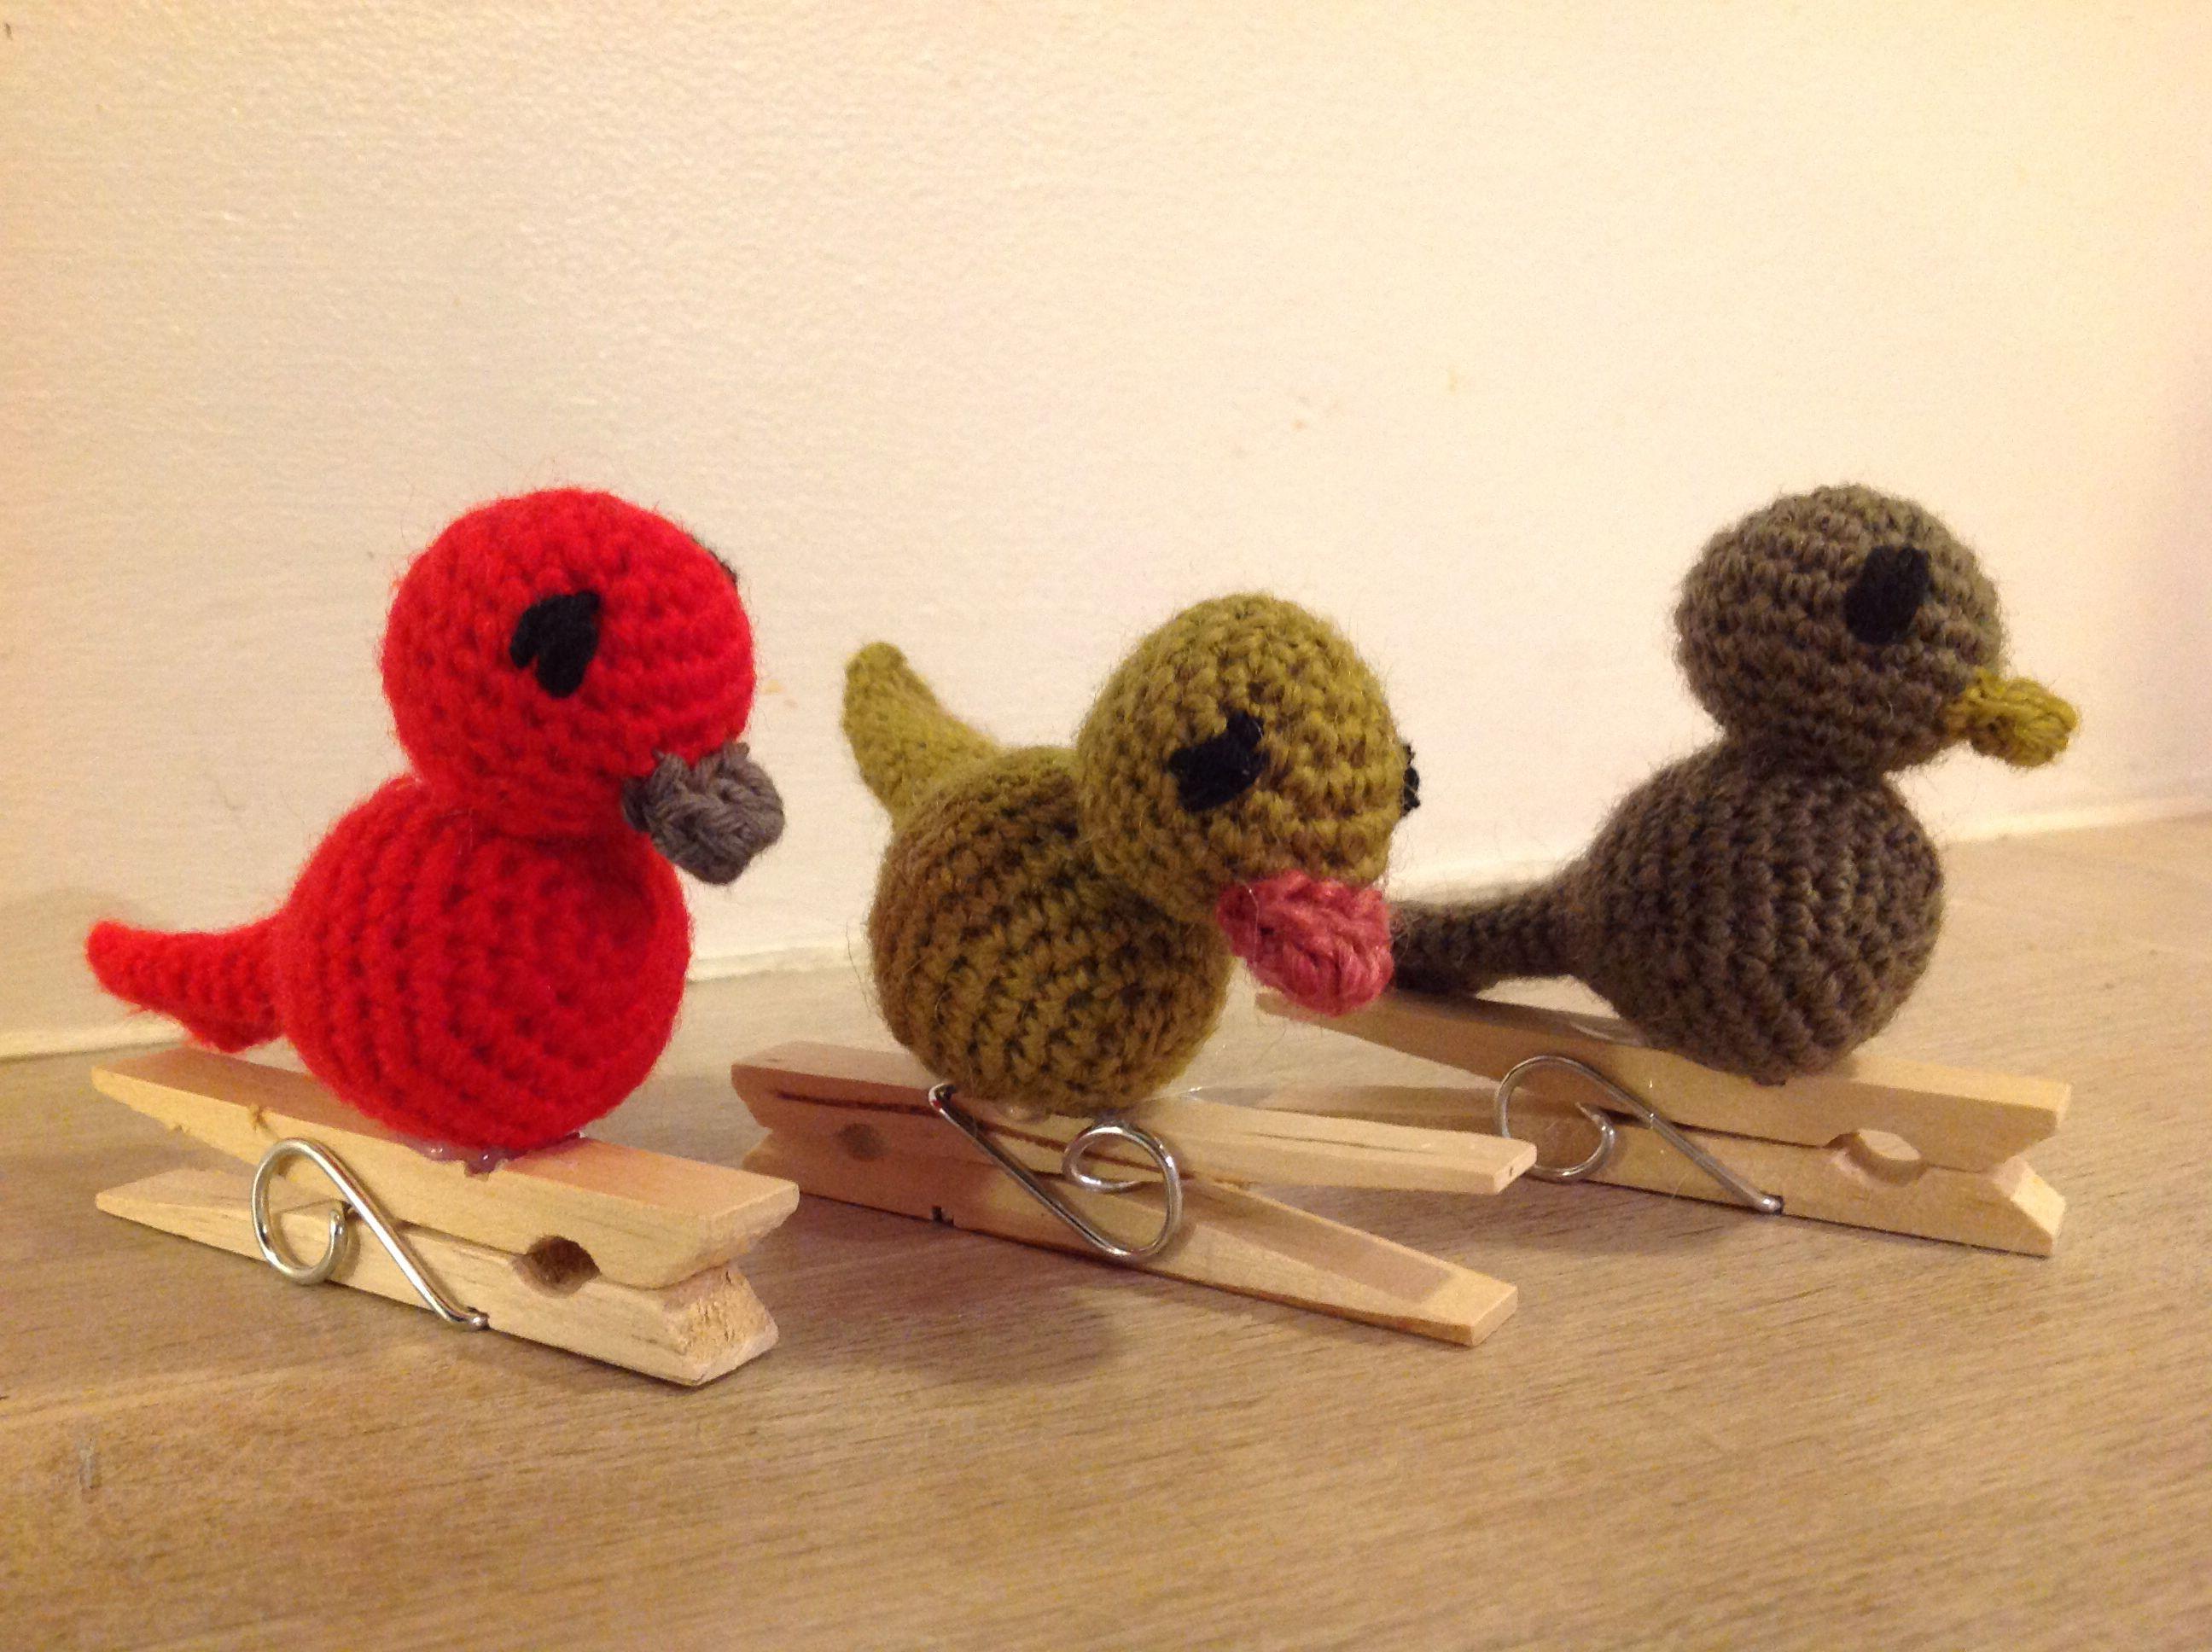 De sødeste hæklede fugle...